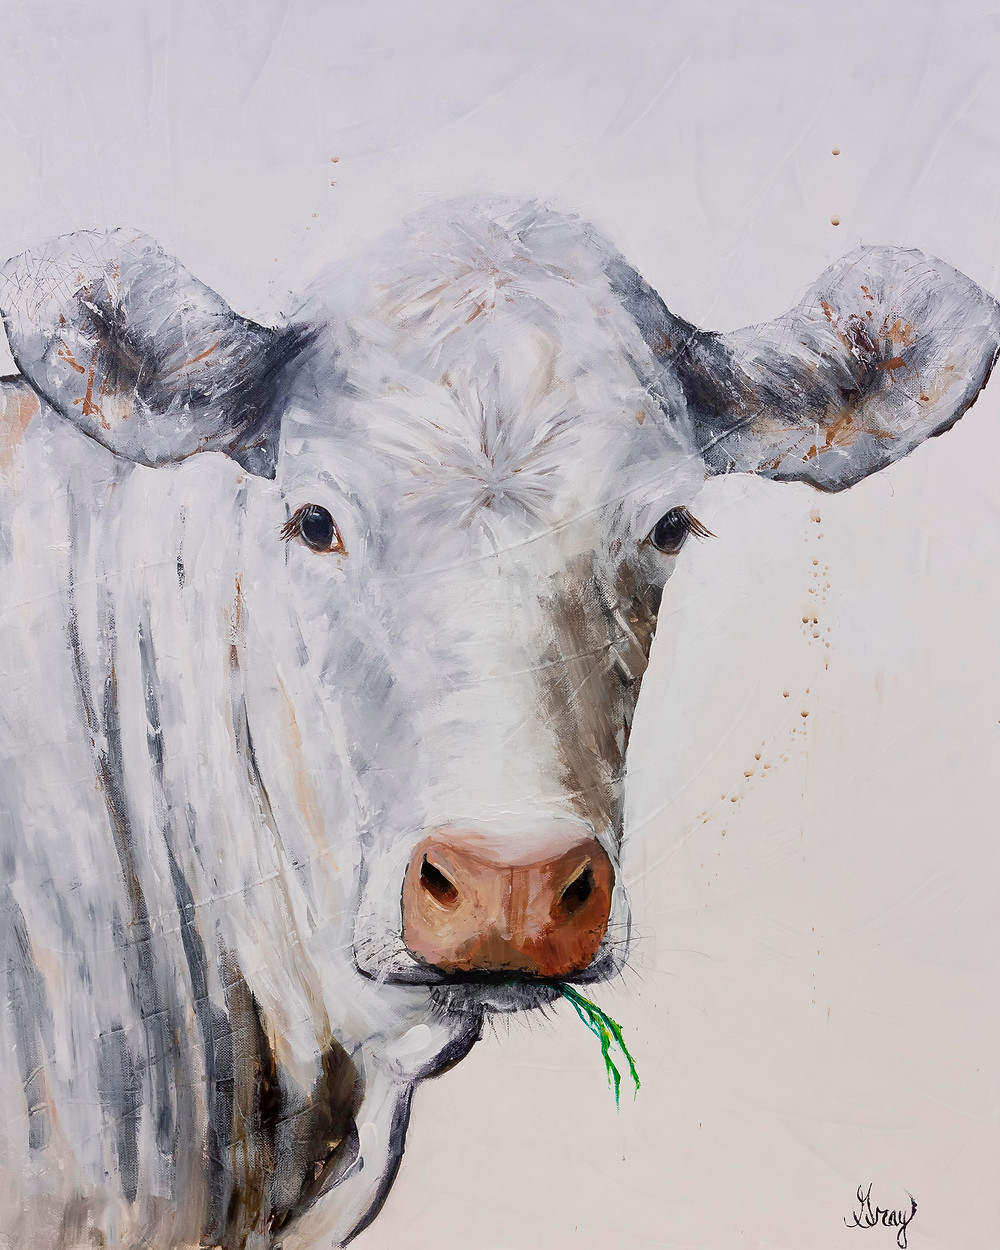 Acrylic on canvas by Gray Artus